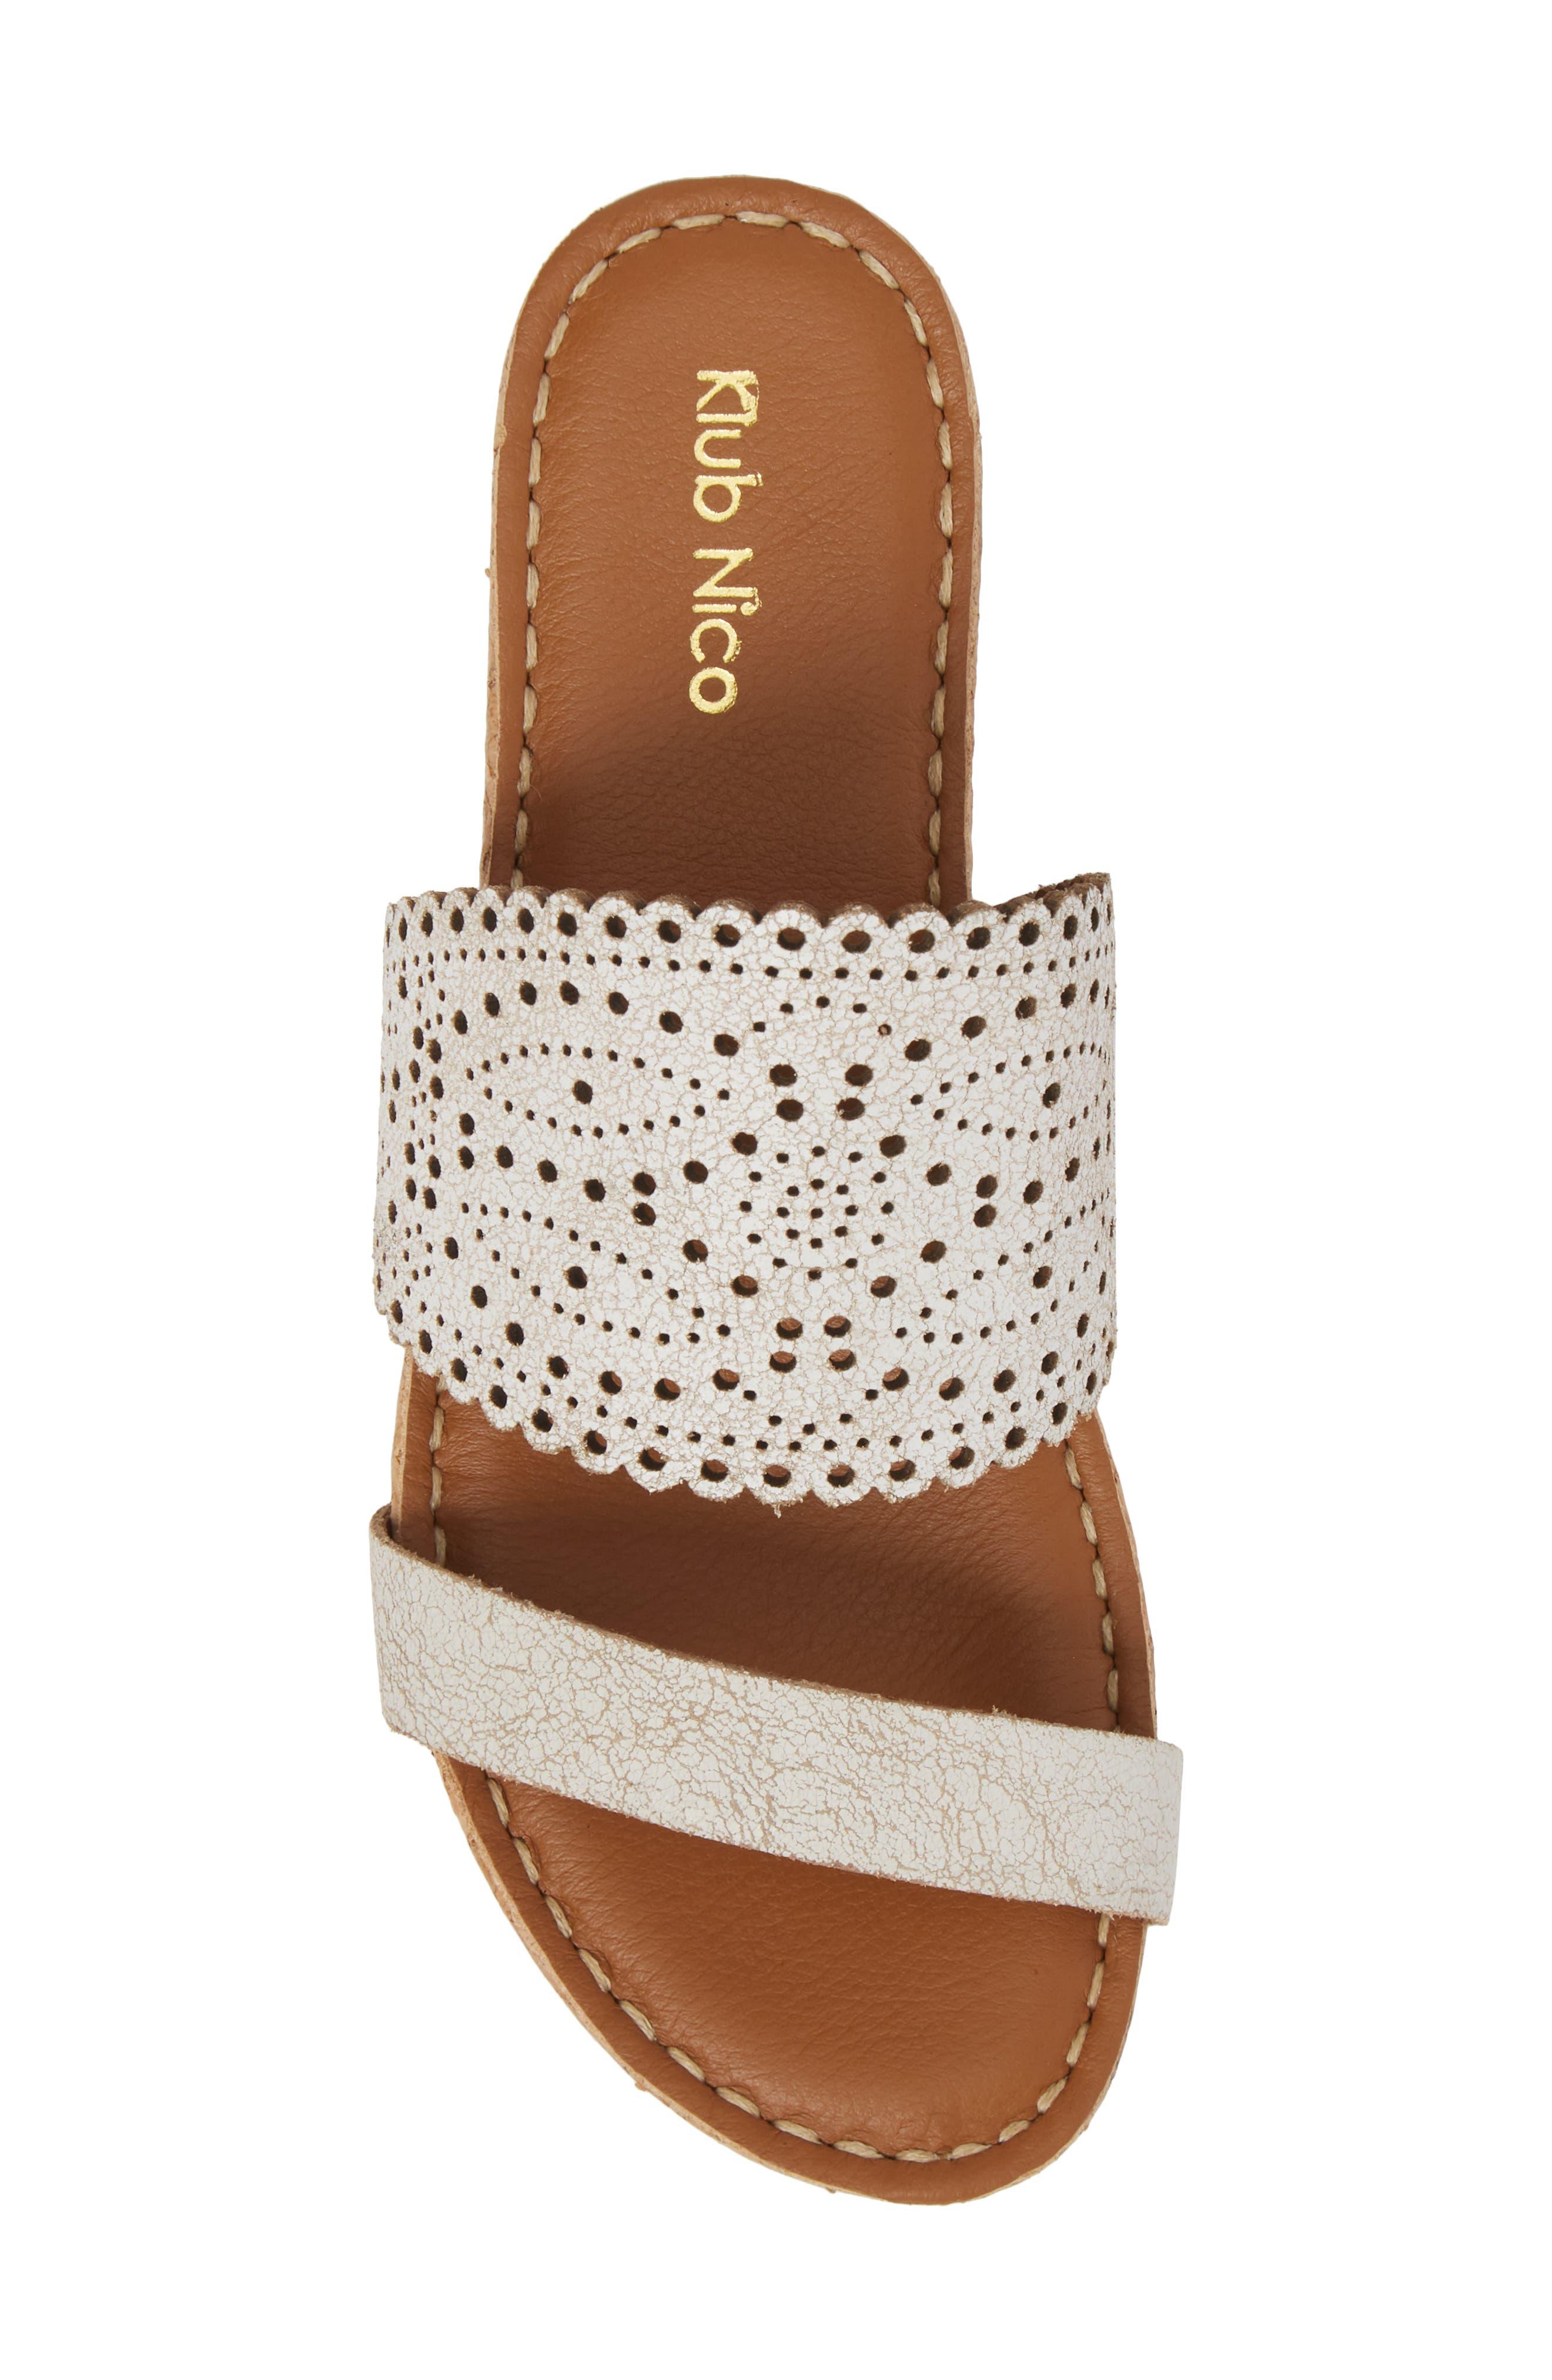 KLUB NICO, Ginette Perforated Slide Sandal, Alternate thumbnail 5, color, WHITE LEATHER